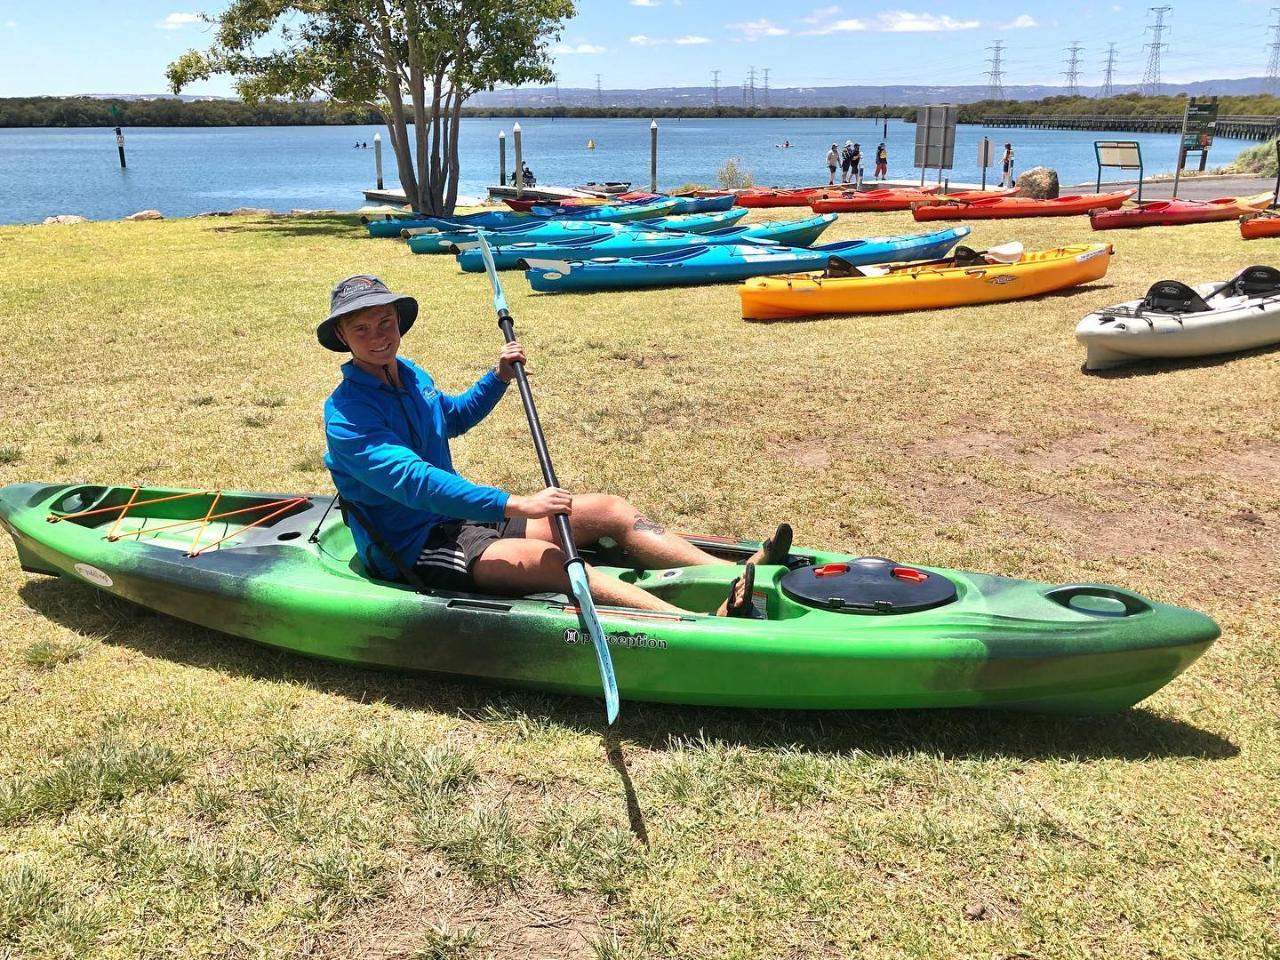 Dolphin Sanctuary & Ships Graveyard Kayak Hire-1-person sit on kayak